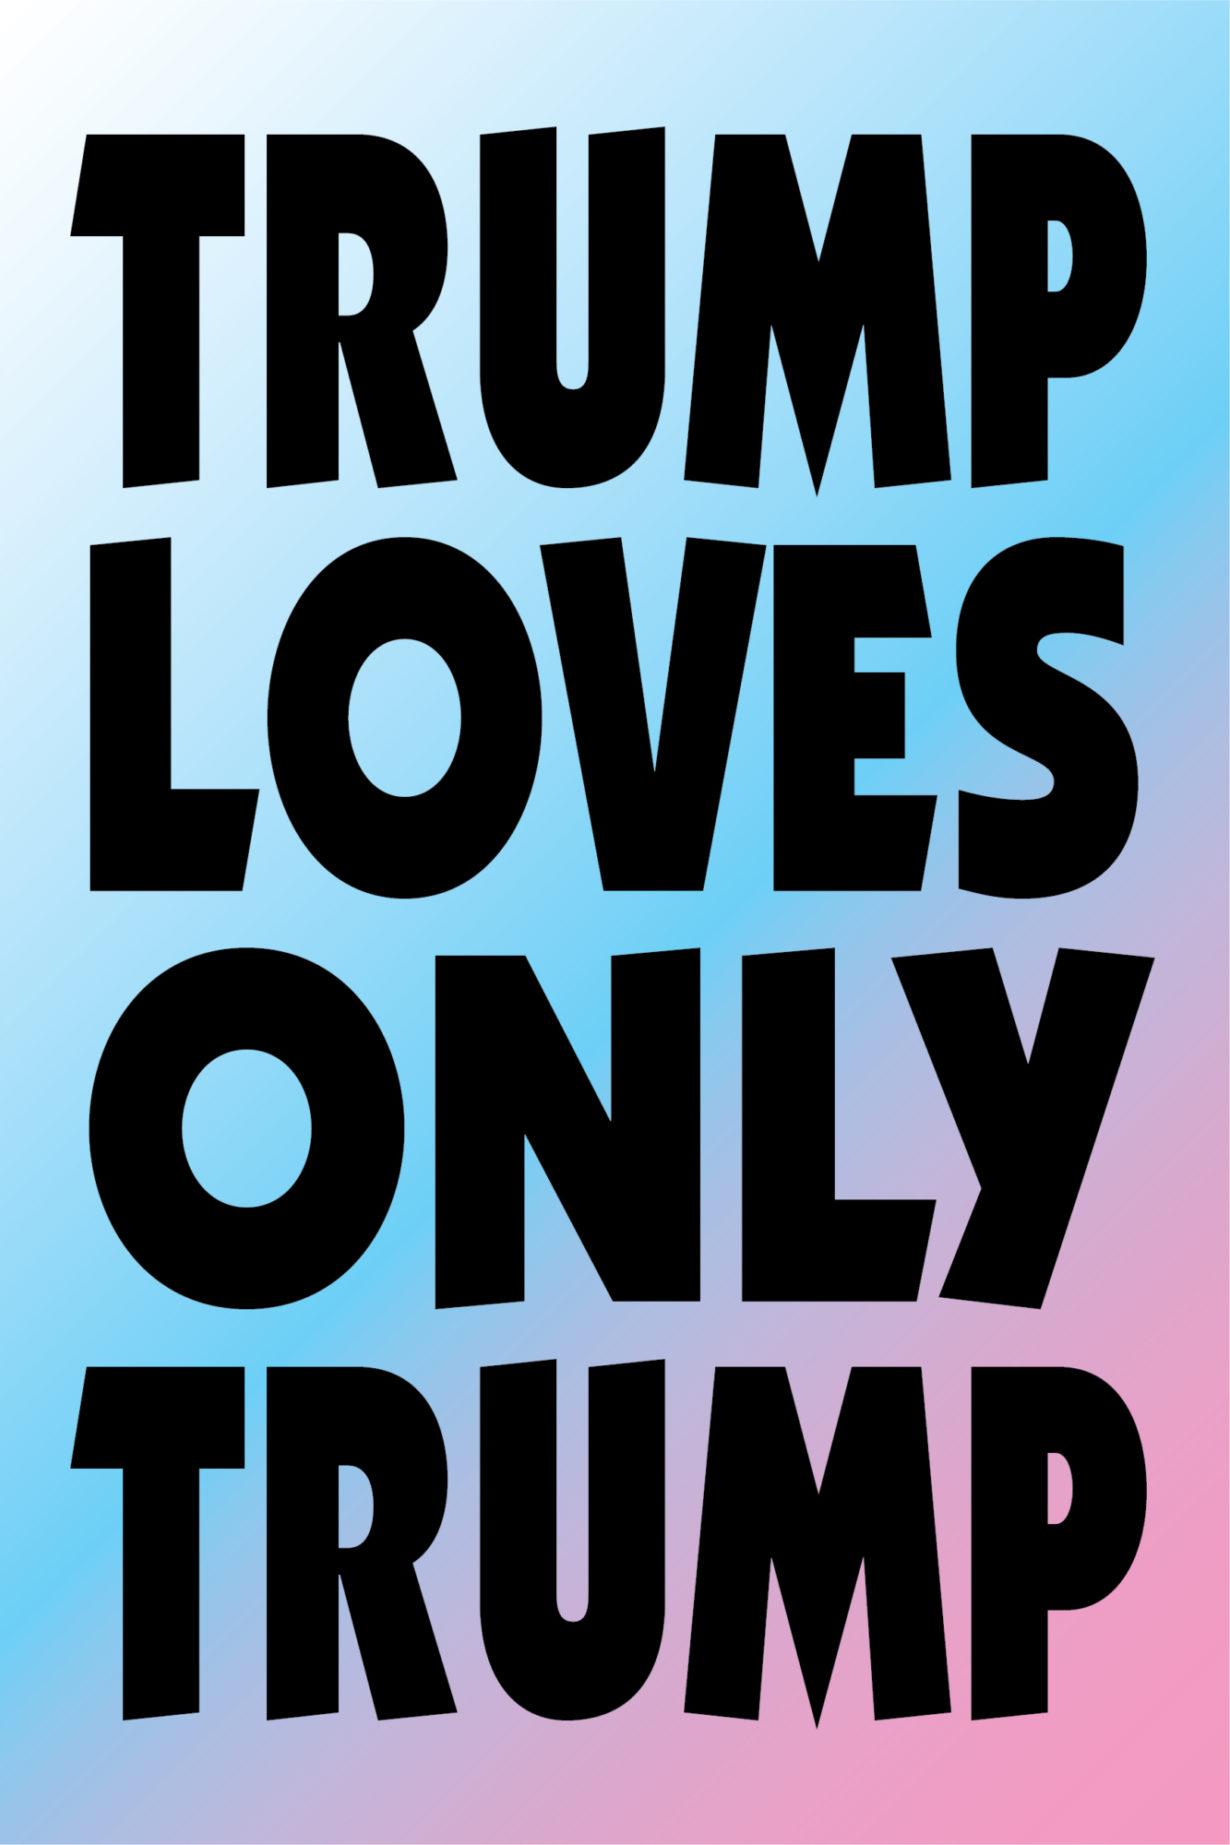 NP_76_100_2017_Trump-Loves-Only-Trump.jpg